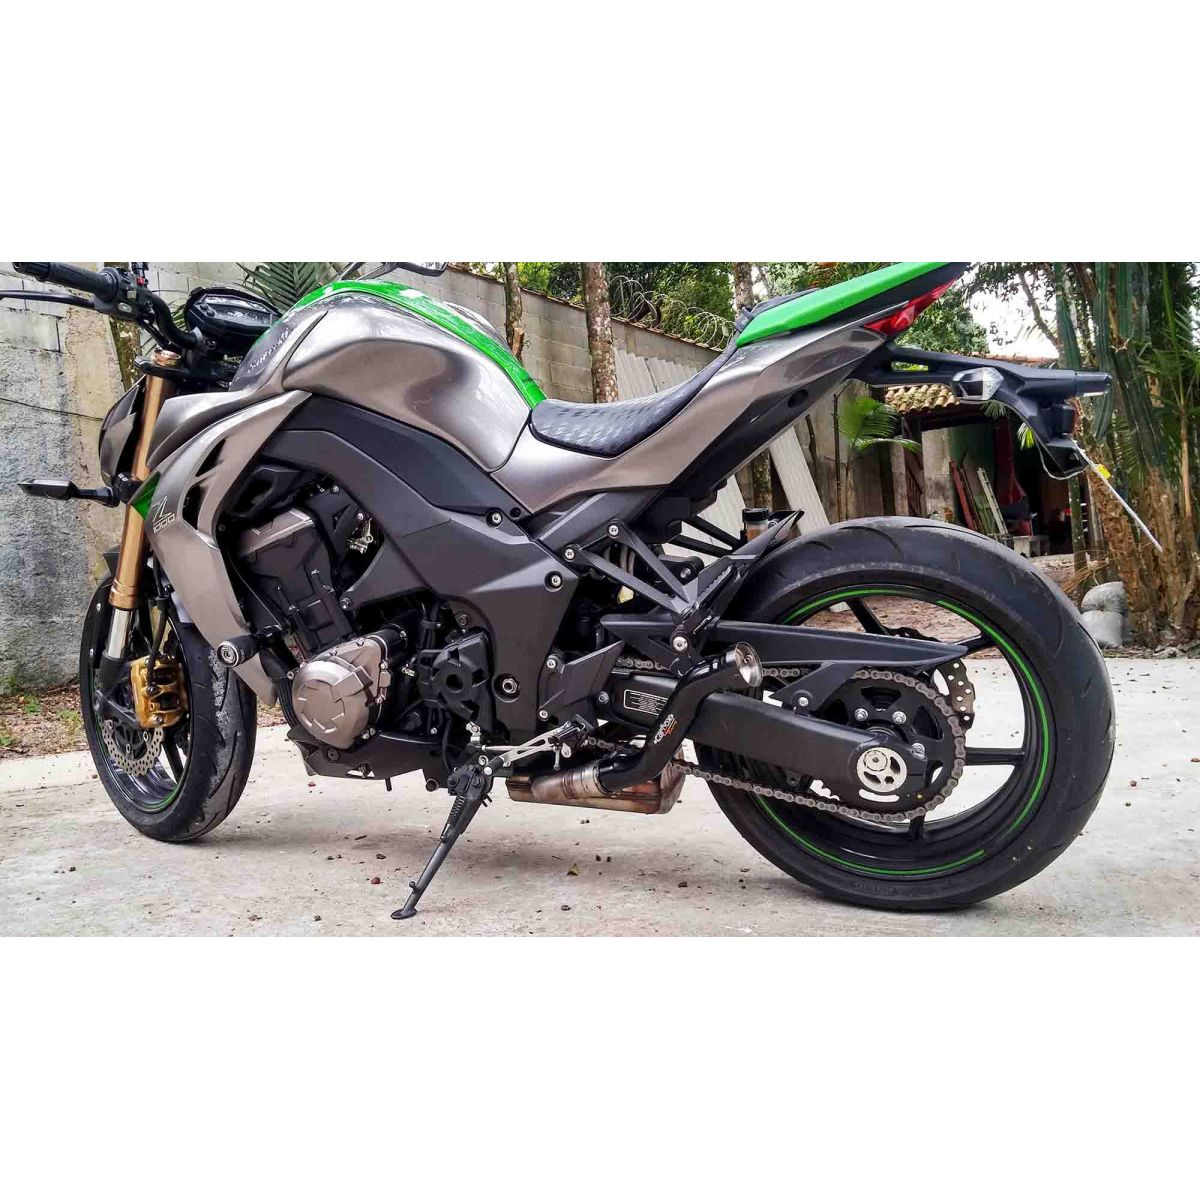 Ponteira Dupla Pipe S Black Edition Kawasaki Z1000 10 A 15